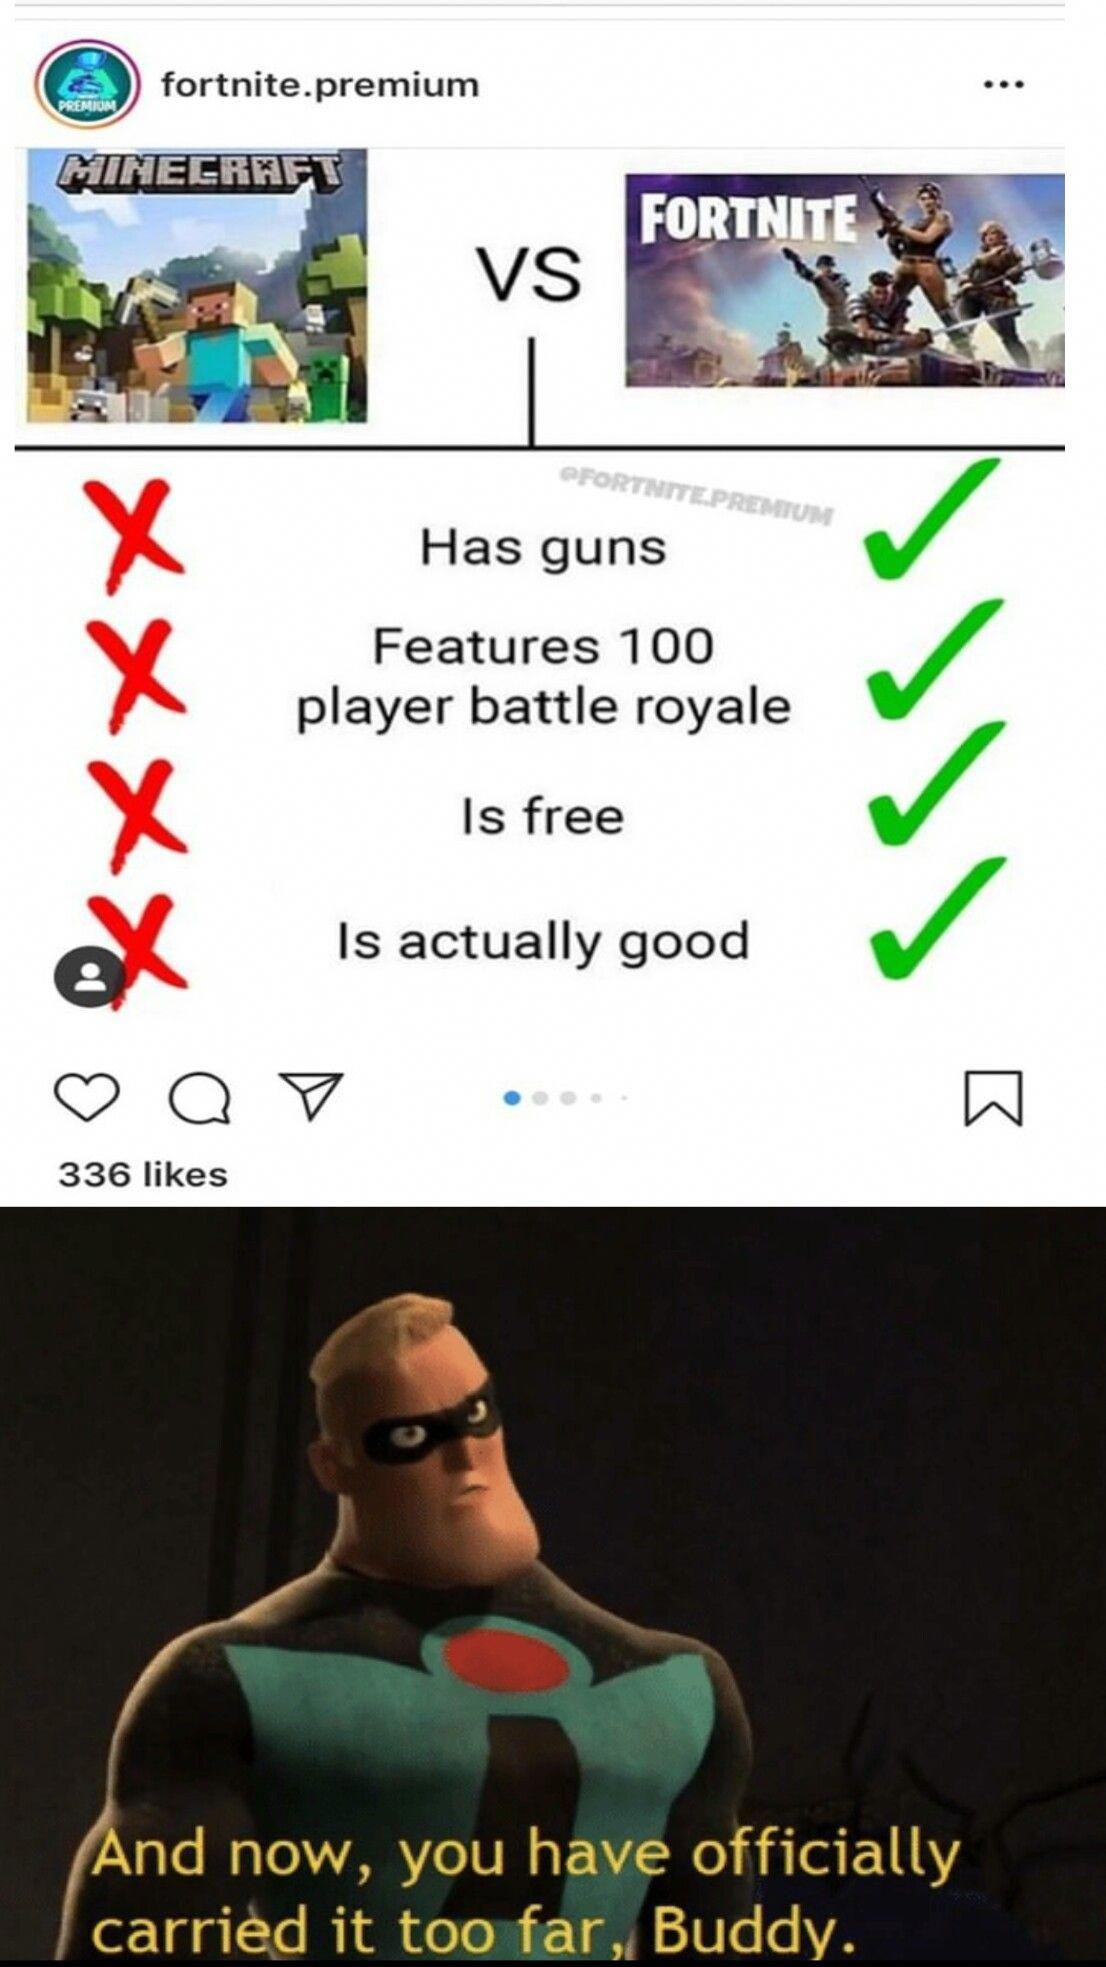 Actually, Minecraft has a free version now, you can modify